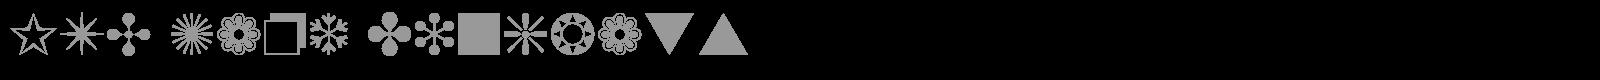 Zapf dingbats font for mac x